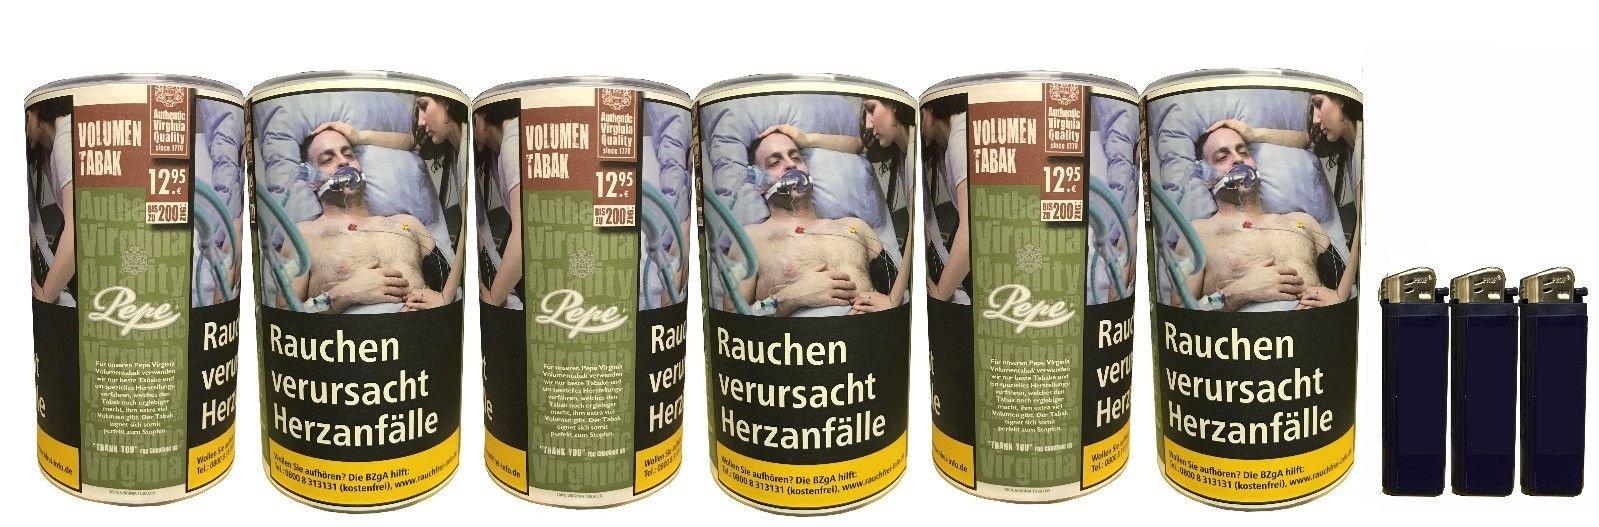 6x Pepe Rich Green Tabak / Volumentabak 85g + Feuerzeuge